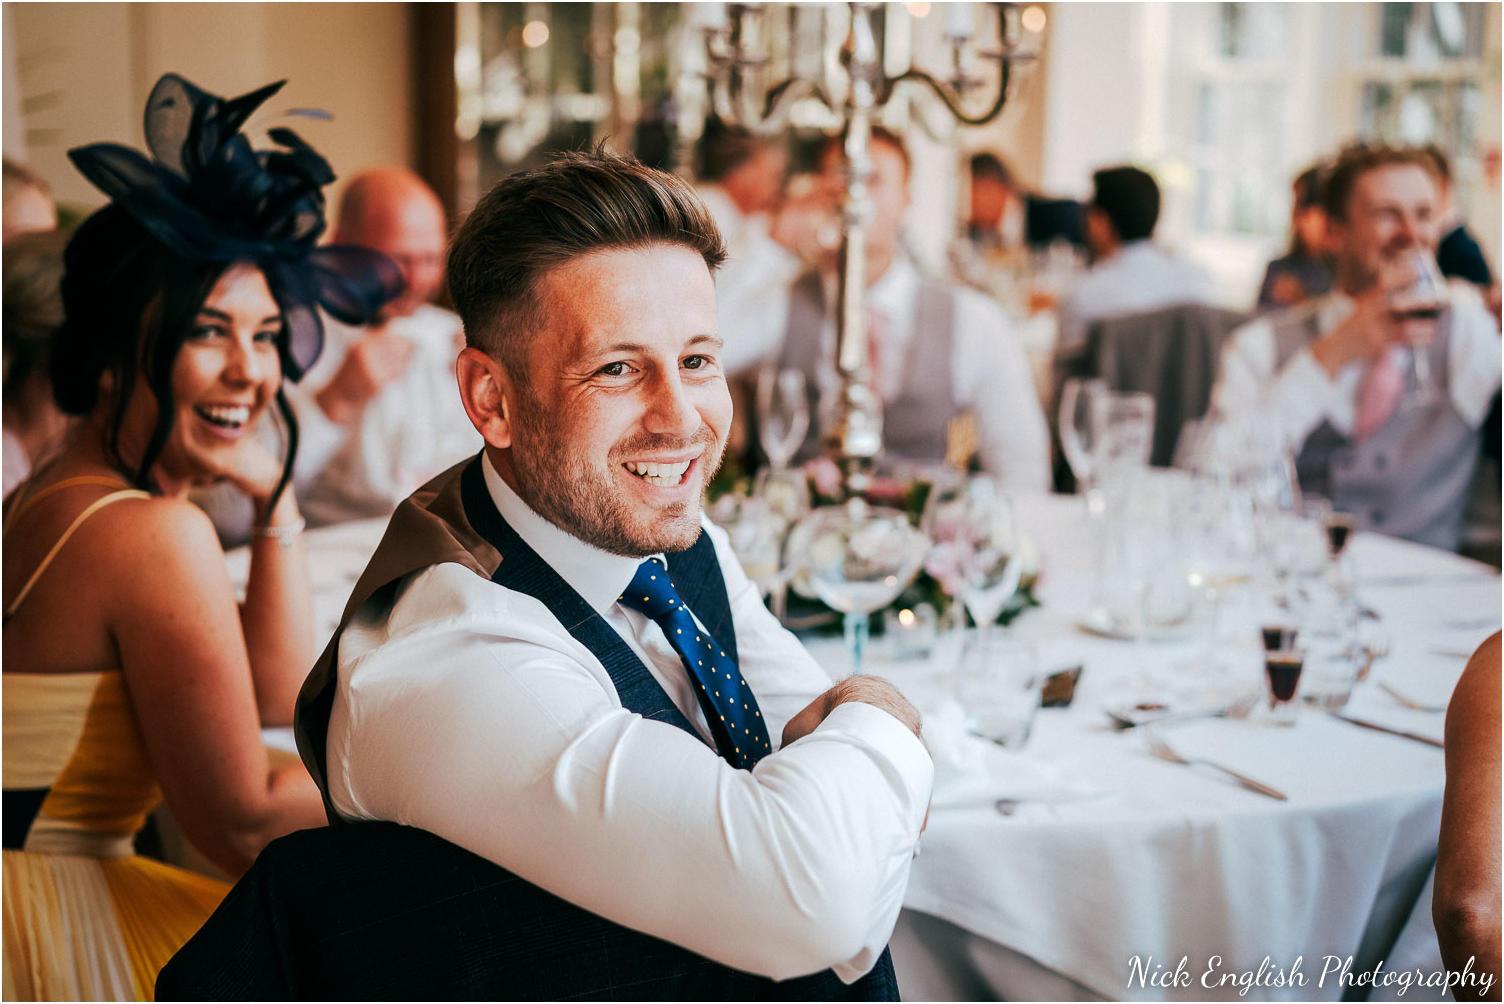 Mitton_Hall_Wedding_Photograph-121.jpg